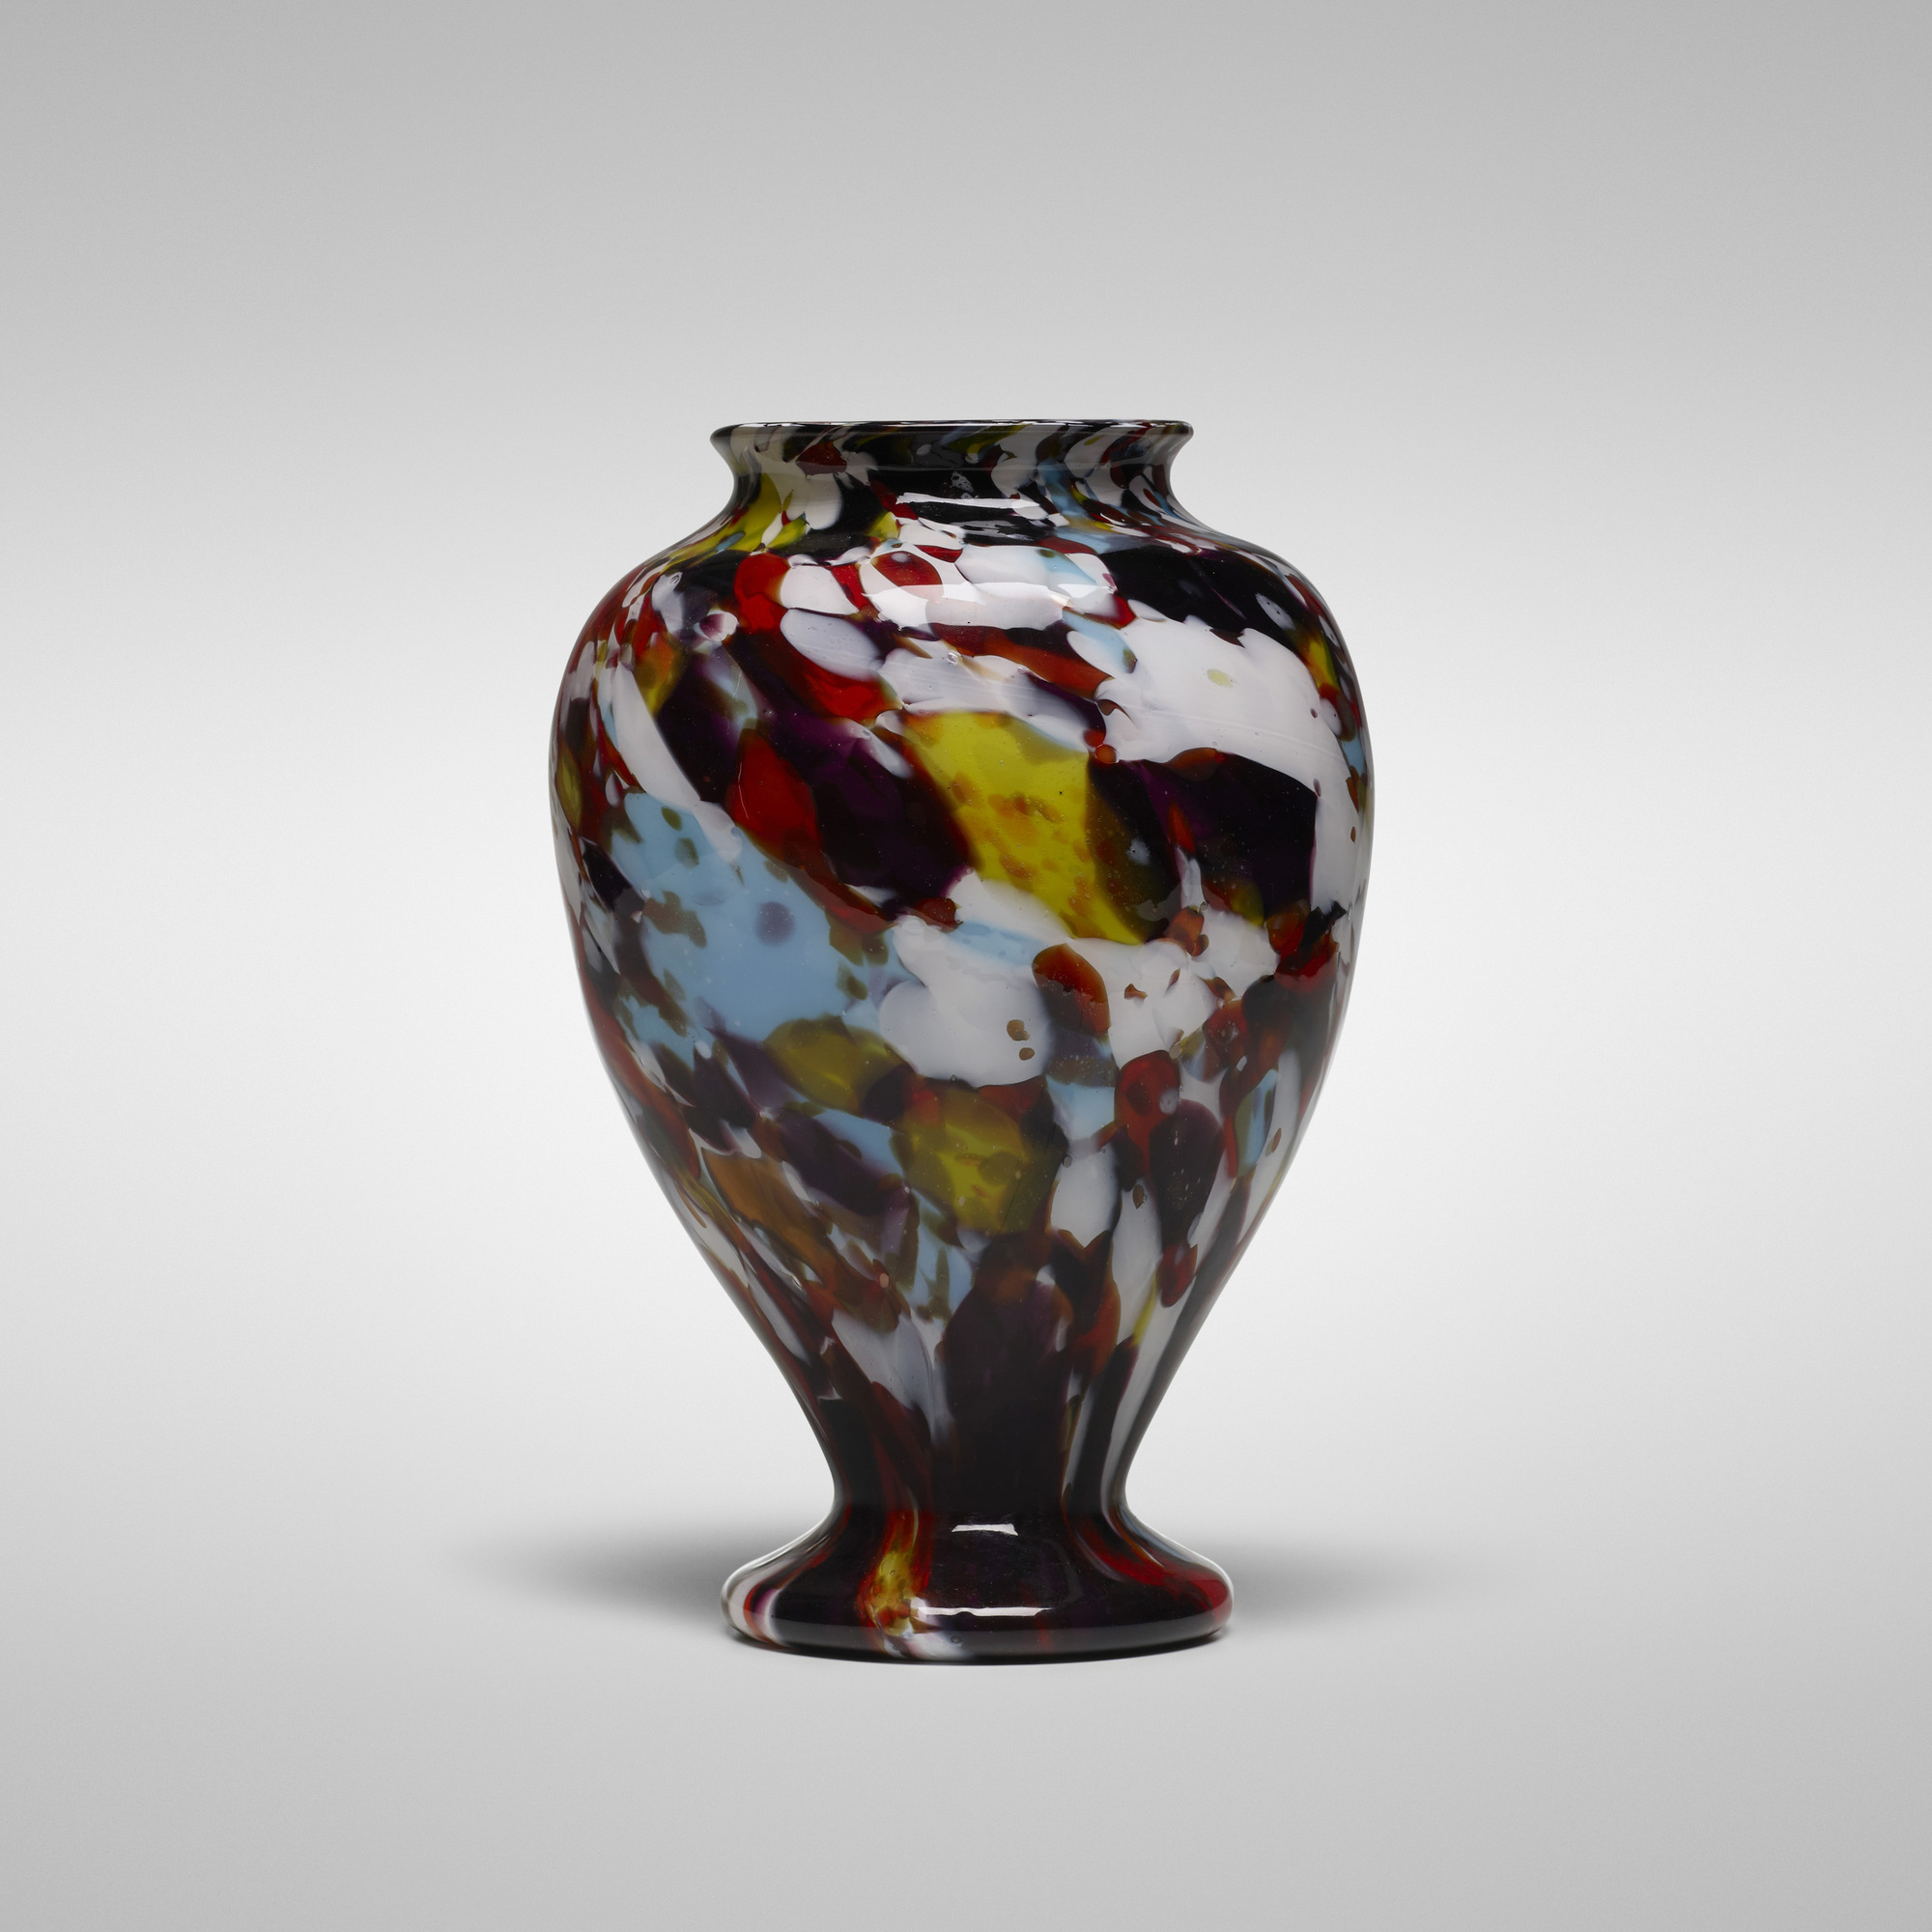 A macchie (mah-key-aye) vase created circa 1890 by the Italian company Francesco Ferro e Figlio.